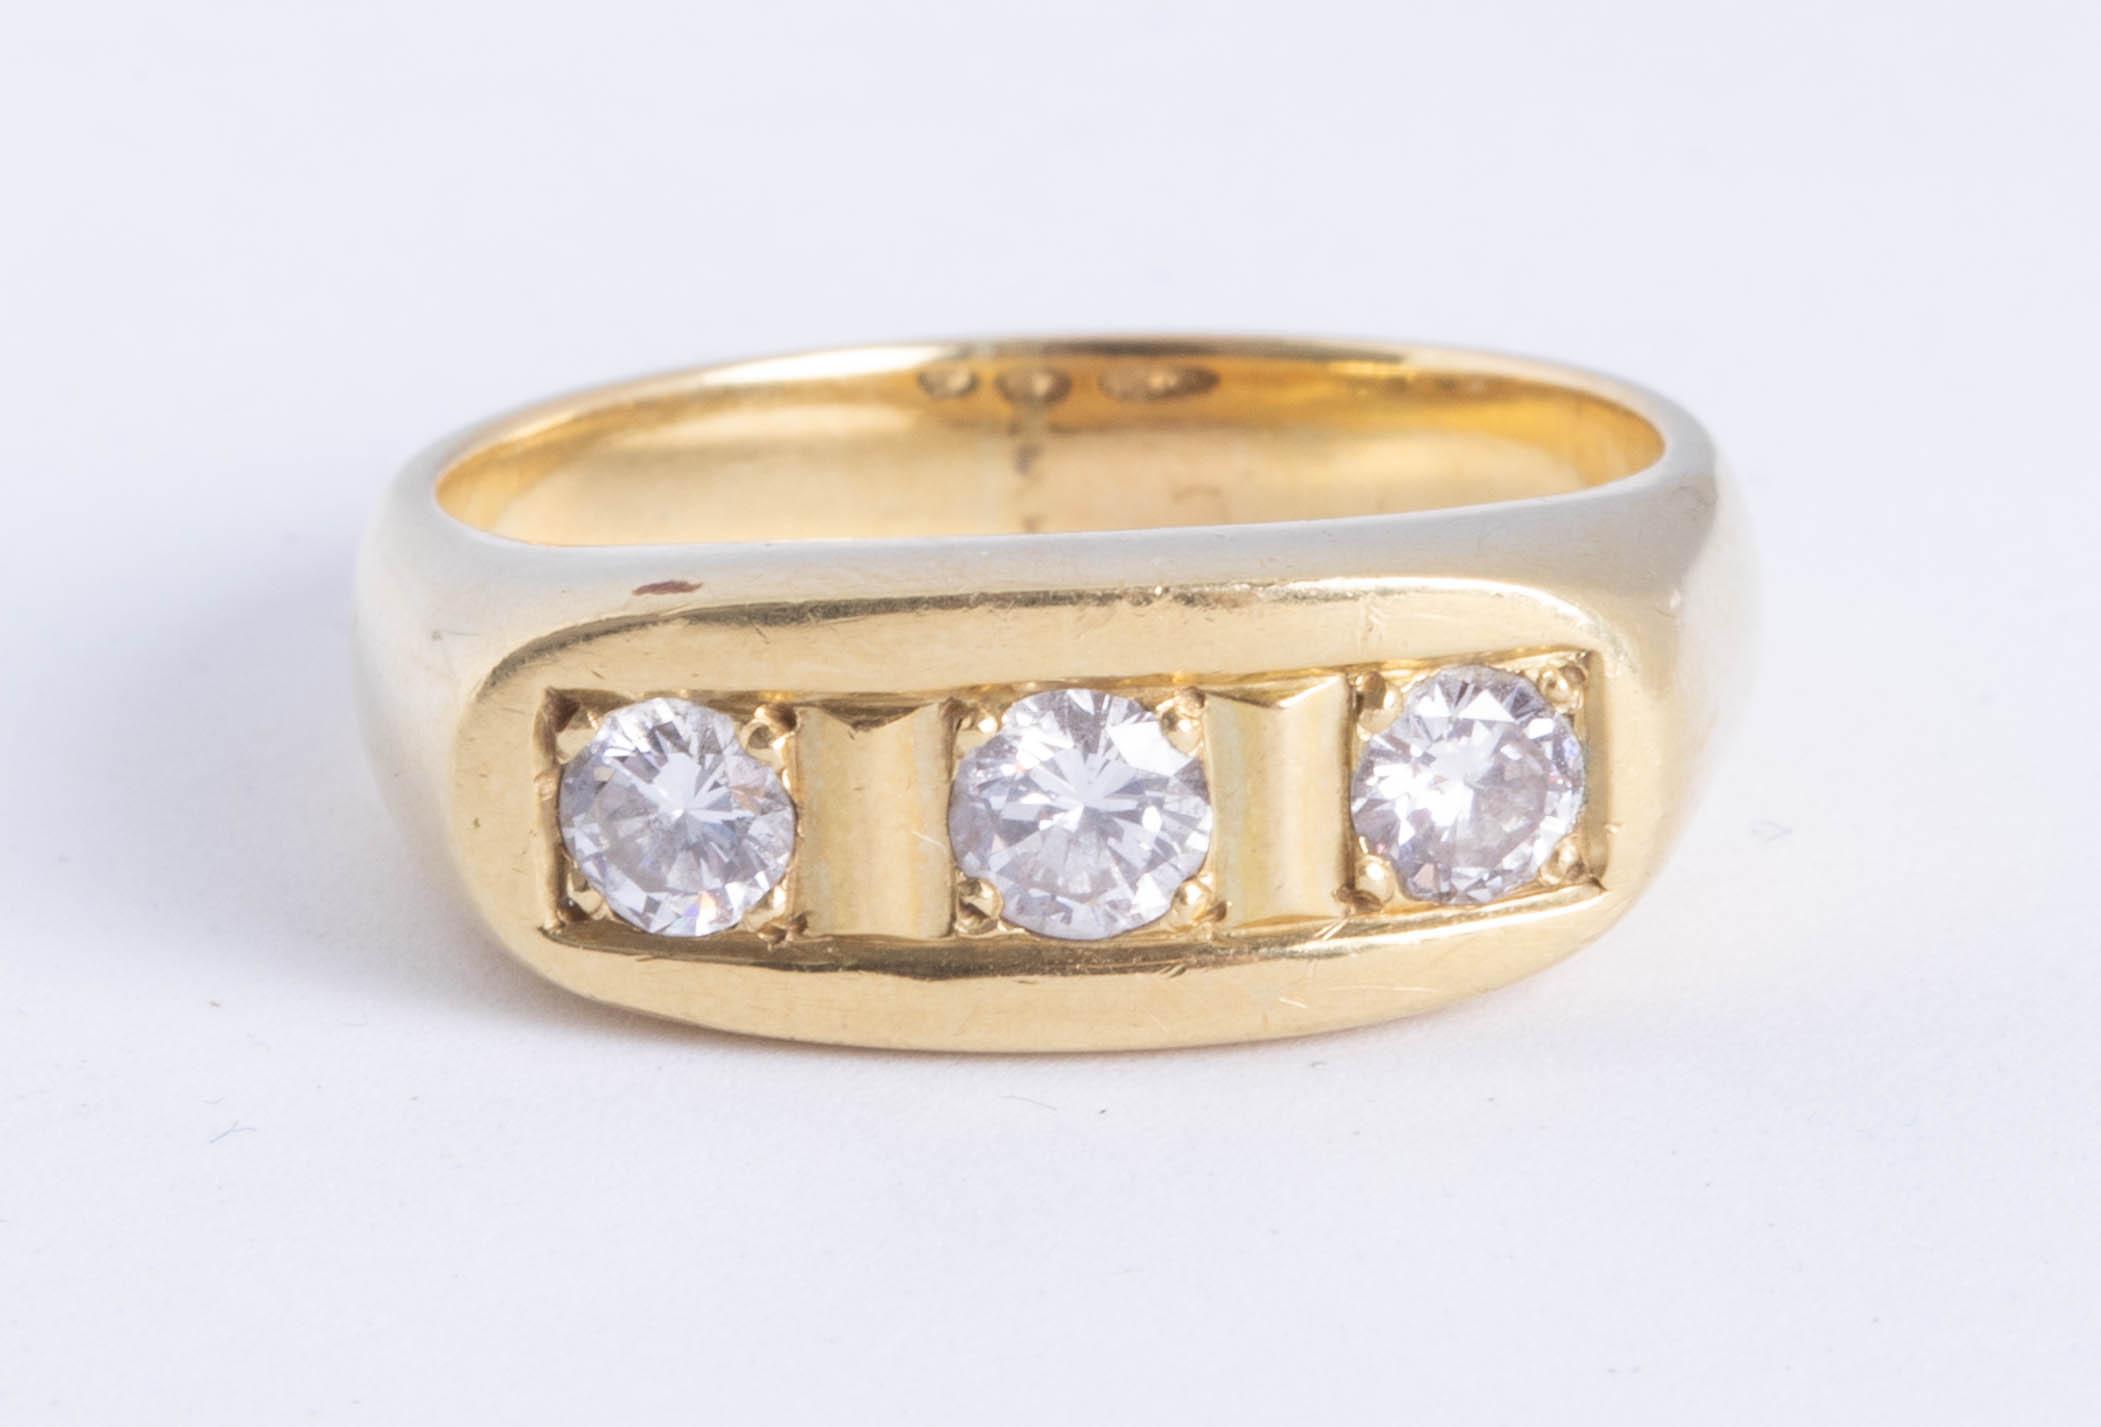 Lot 054 - An 18ct yellow gold diamond three stone ring, approx 60 pts, size U.